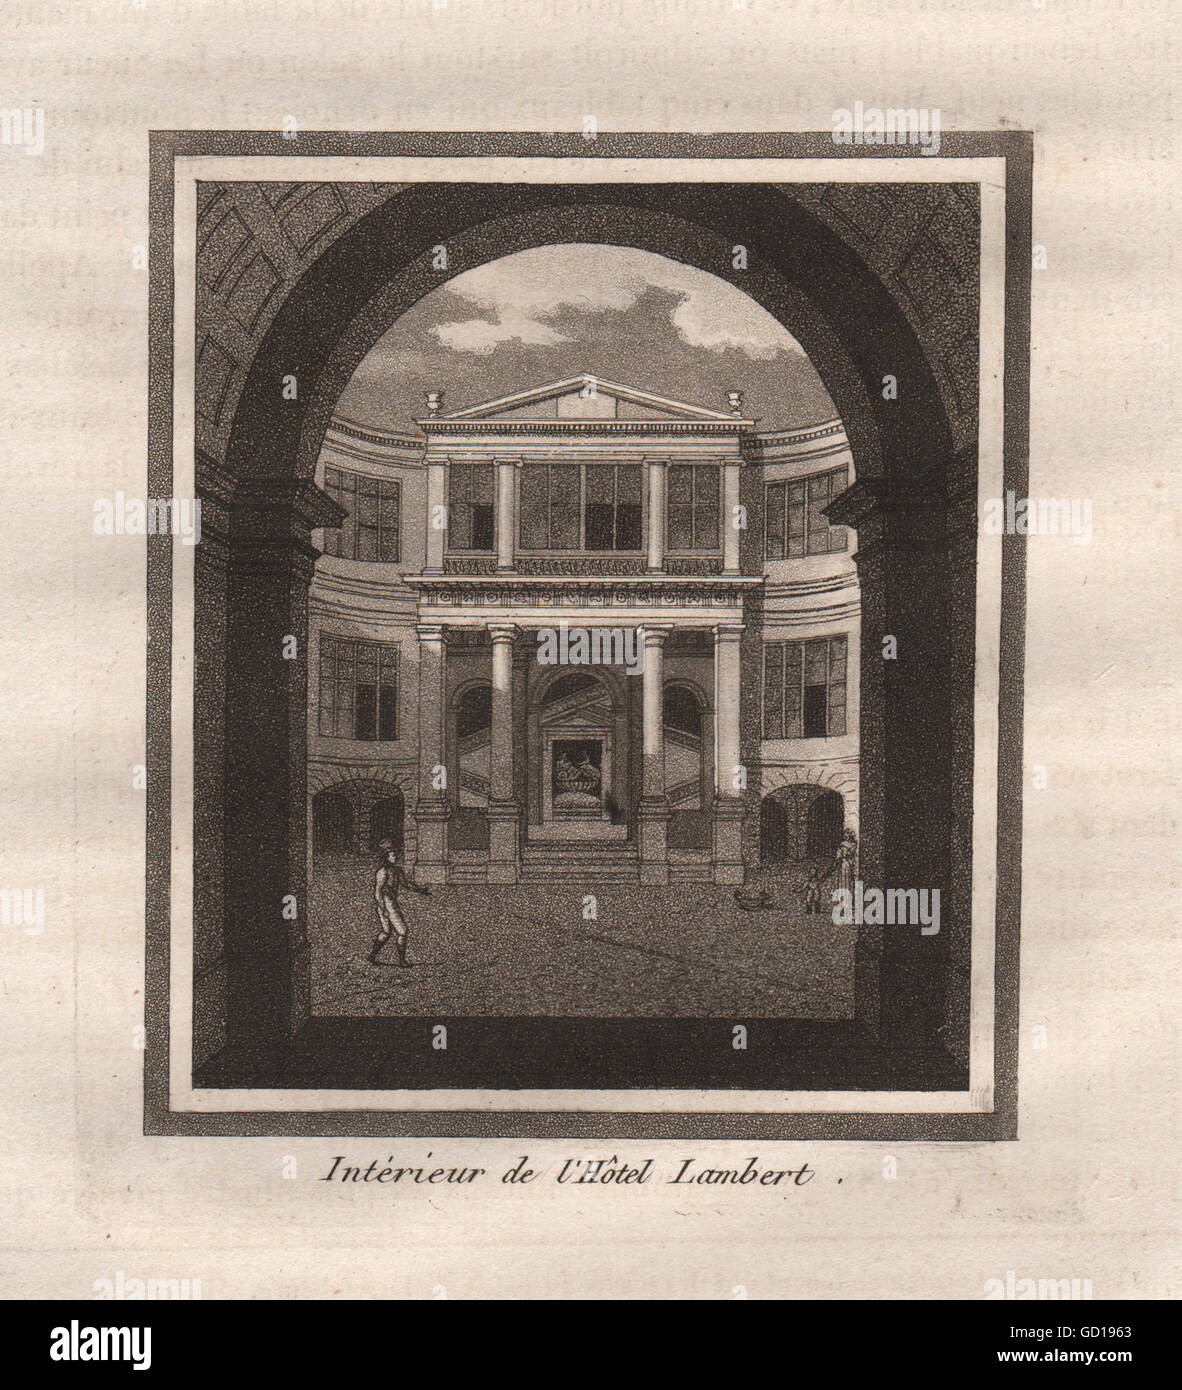 PARIS: Intérieur de l'Hôtel Lambert. Aquatinta, antiken Druck 1808 Stockfoto